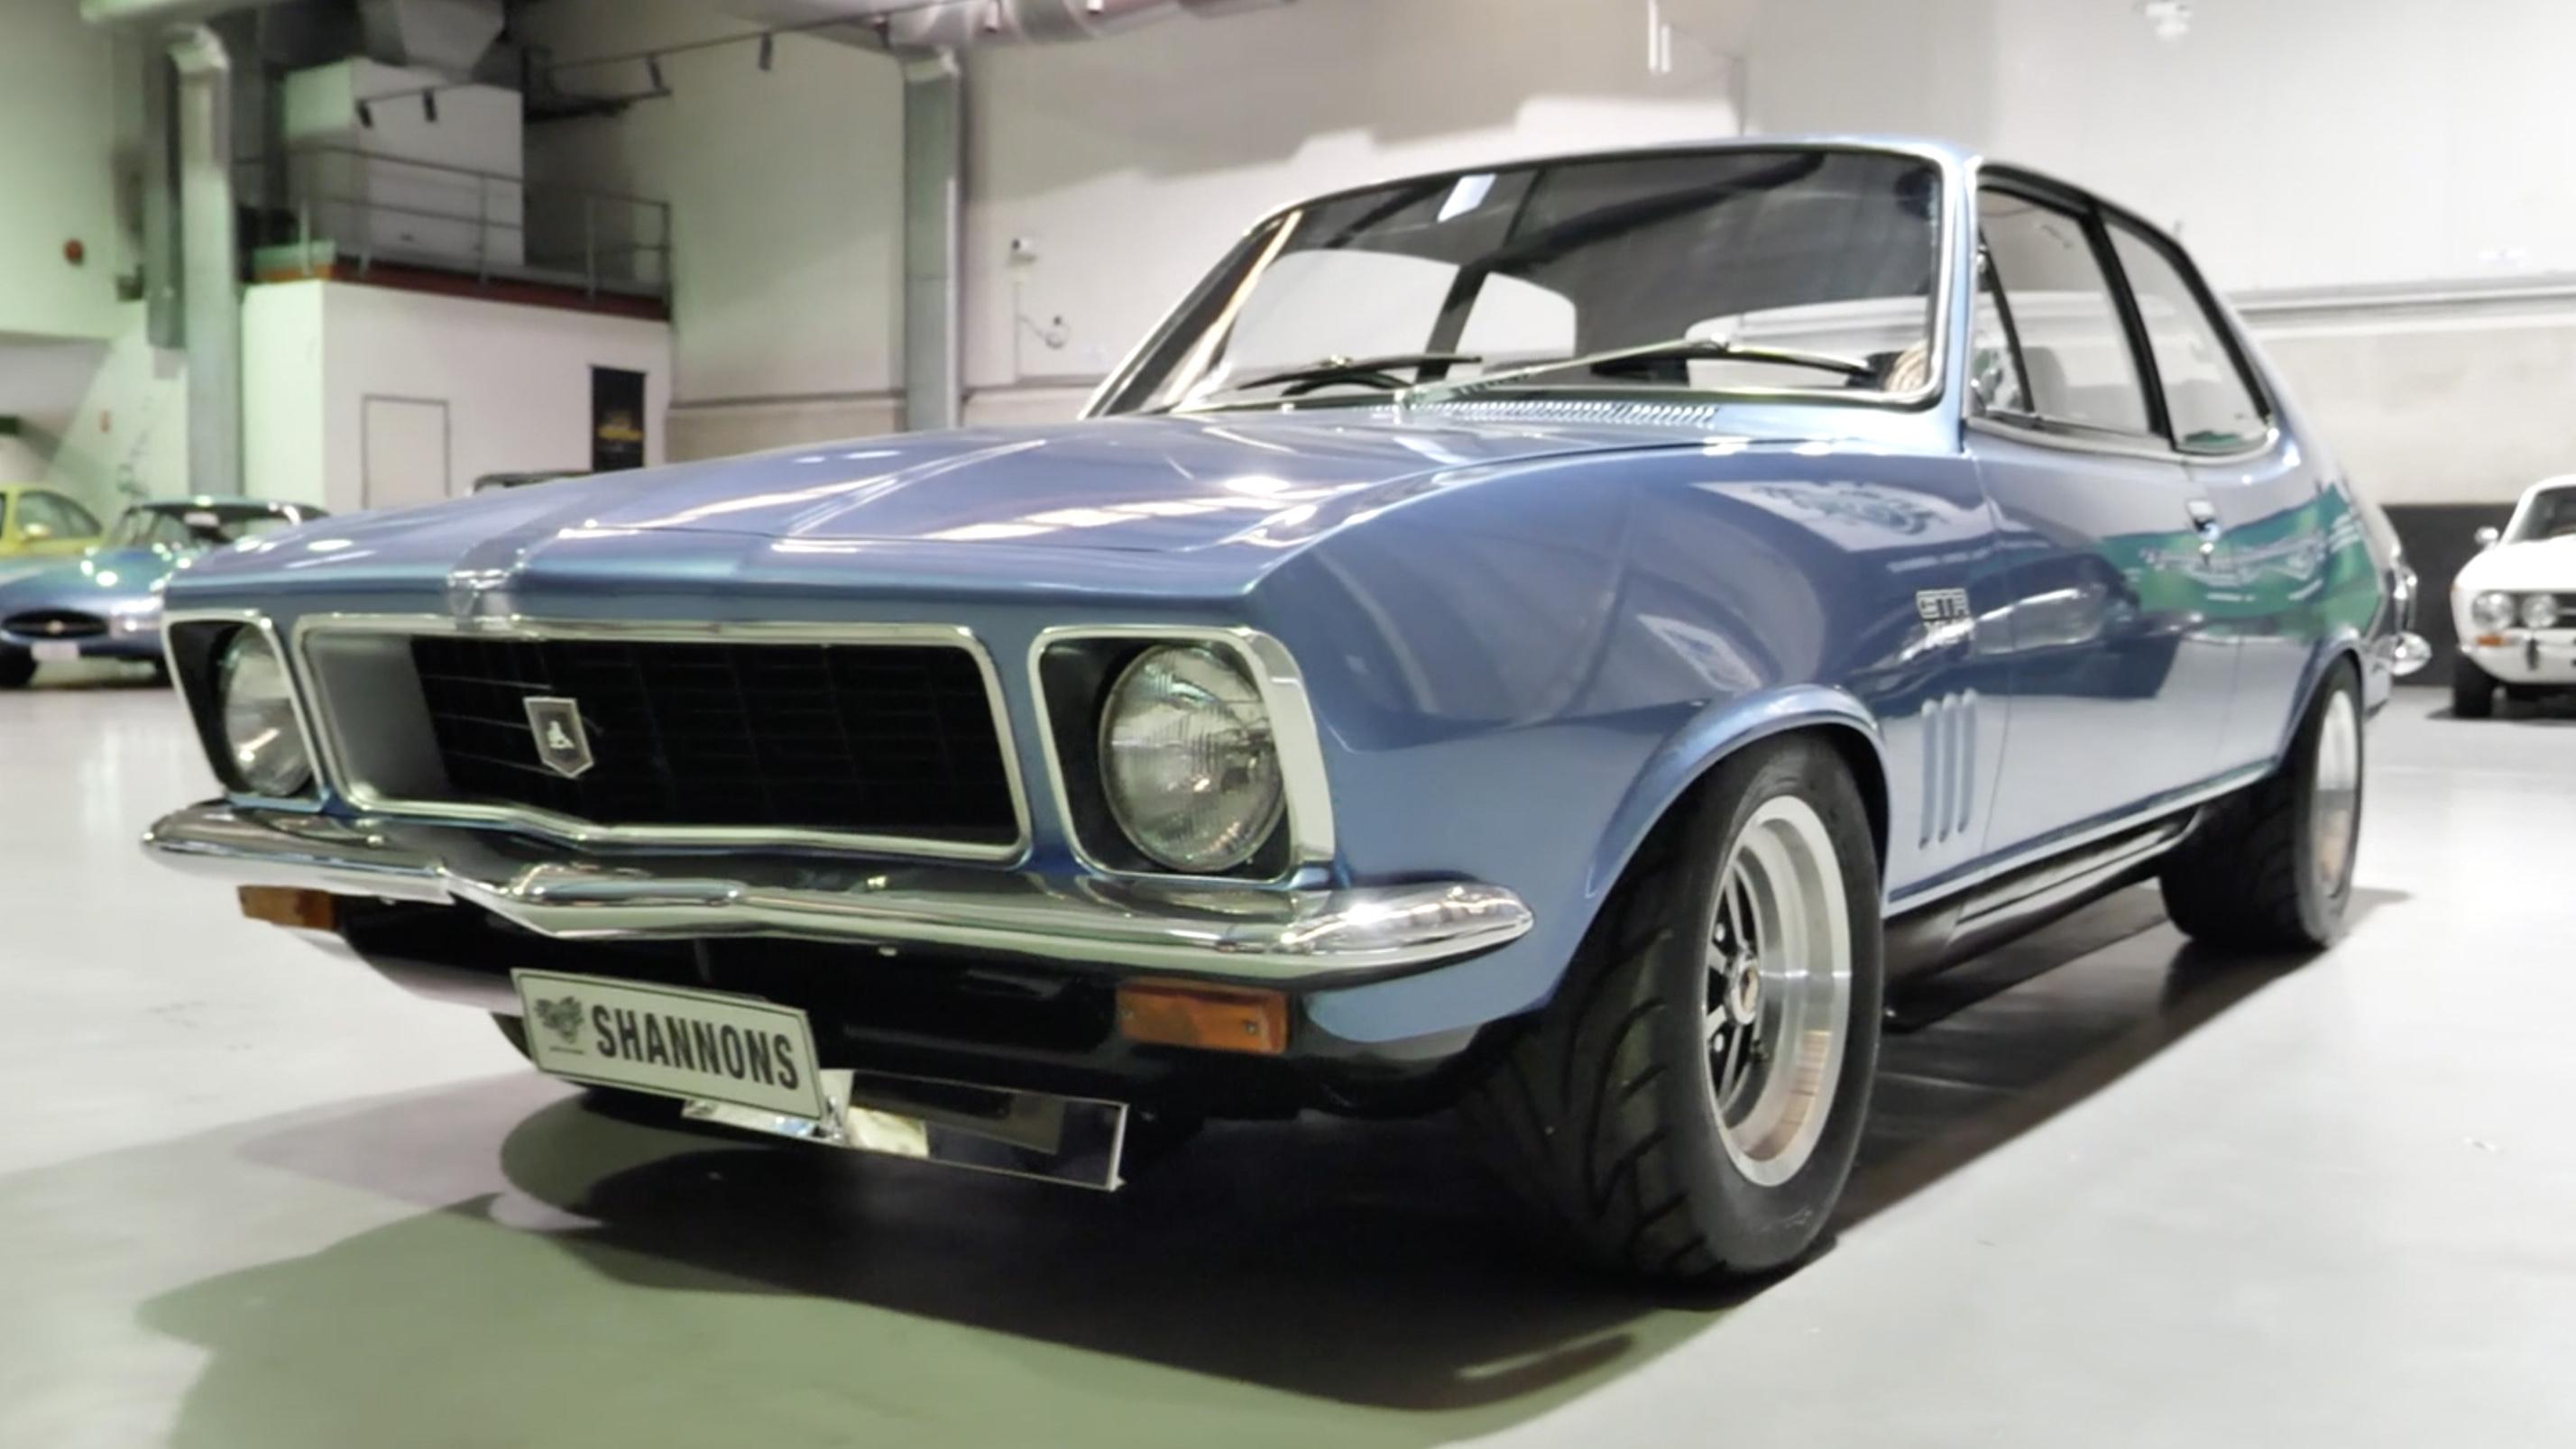 1973 Holden LJ Torana GTR XU-1 Sedan - 2020 Shannons Spring Timed Online Auction